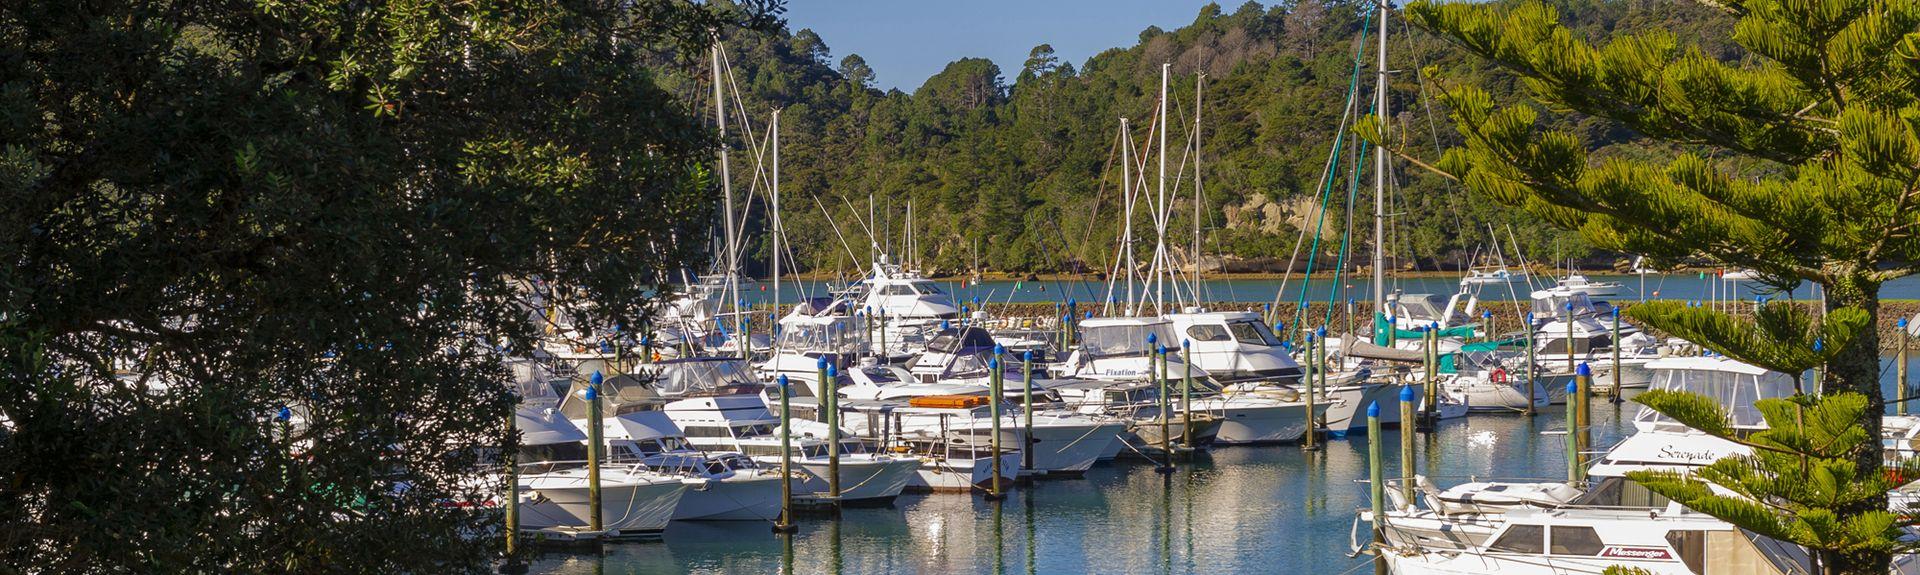 Cooks Beach, Thames-Coromandel, Waikato, New Zealand